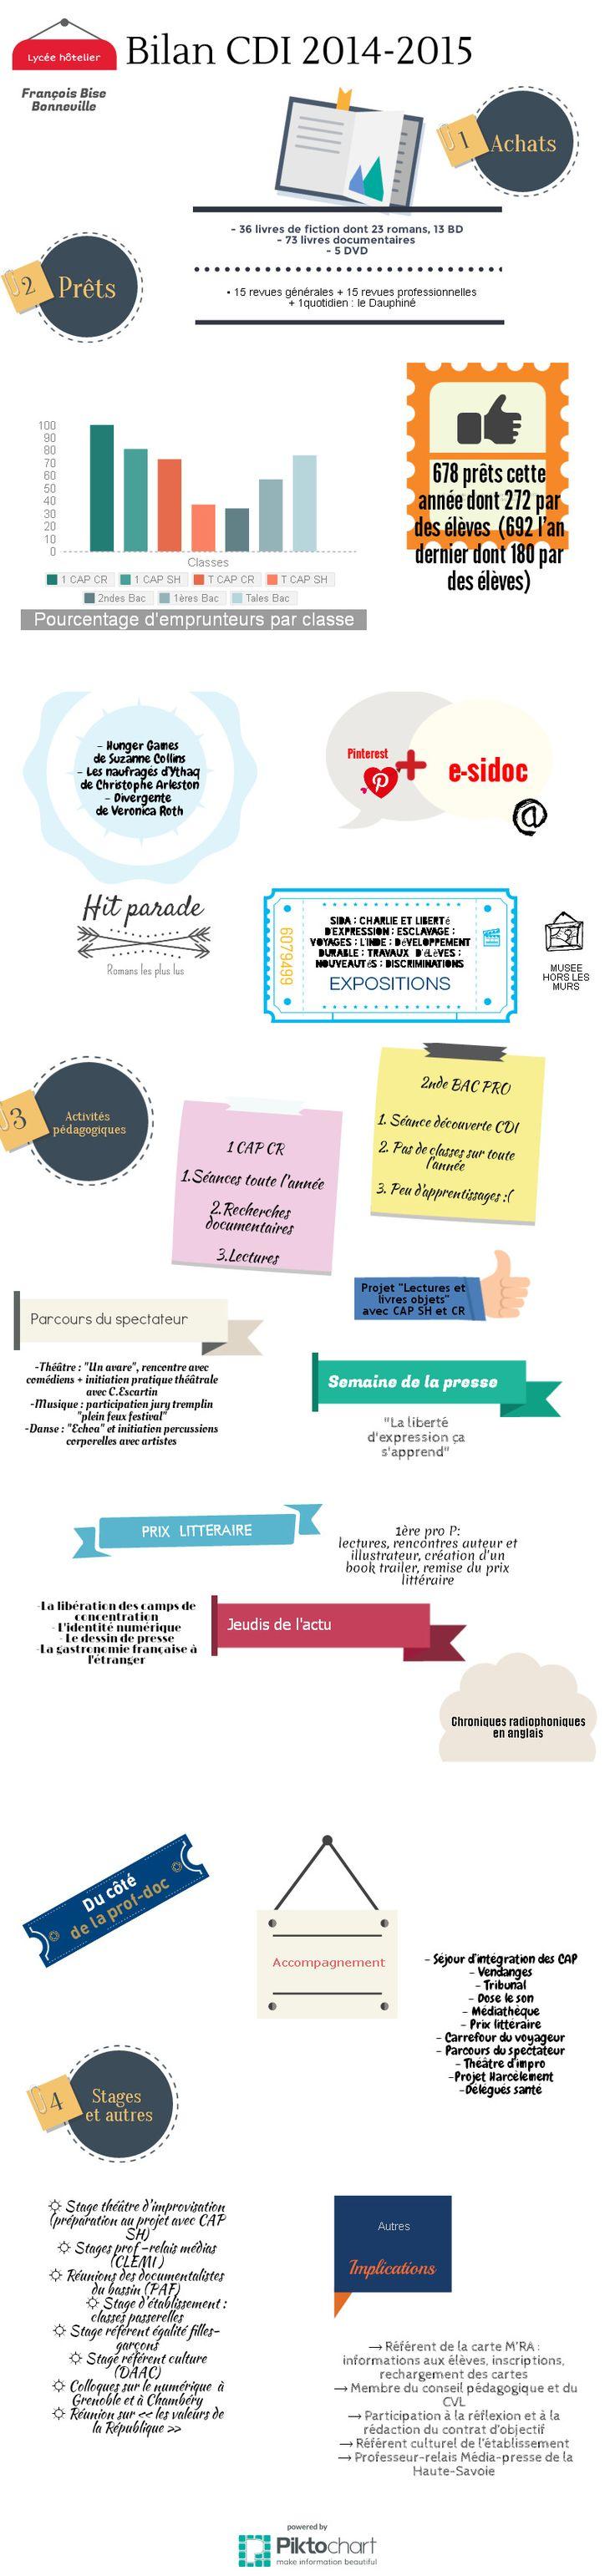 Bilan CDI lycée hôtelier Bise 2014-2015    @Piktochart Infographic